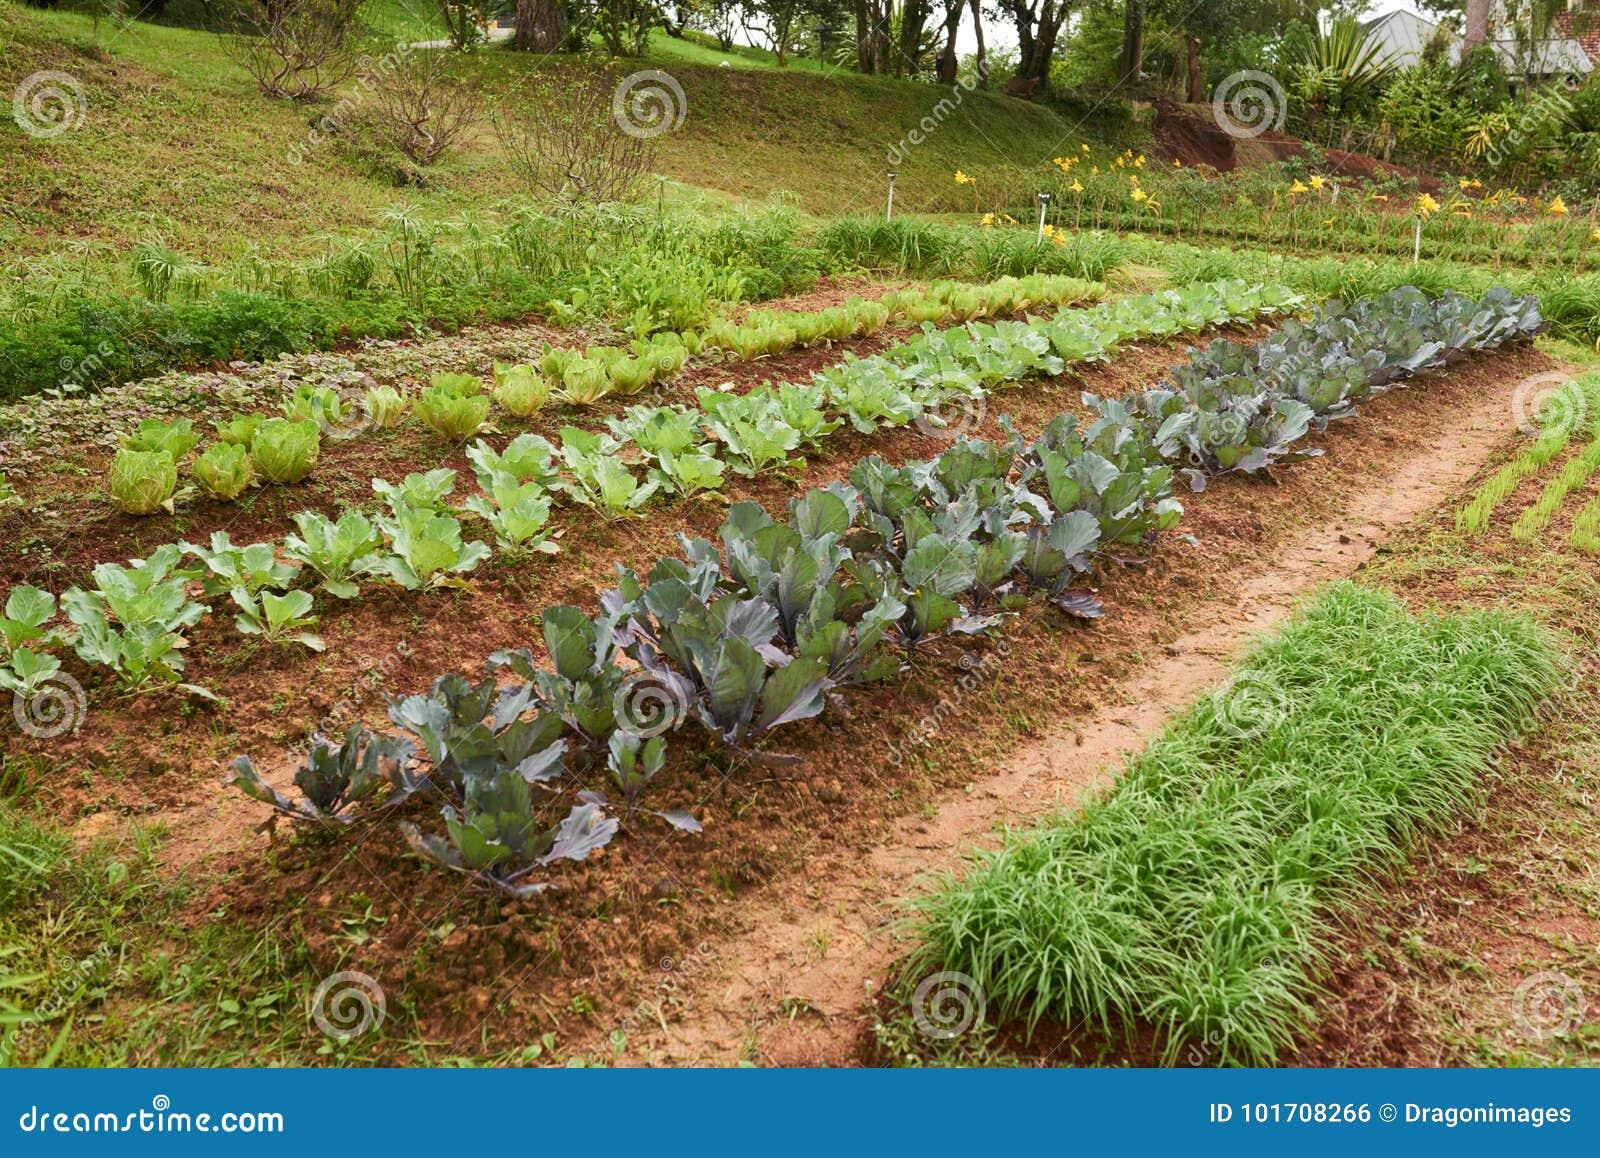 Vegetable Garden stock photo. Image of food, plants - 101708266